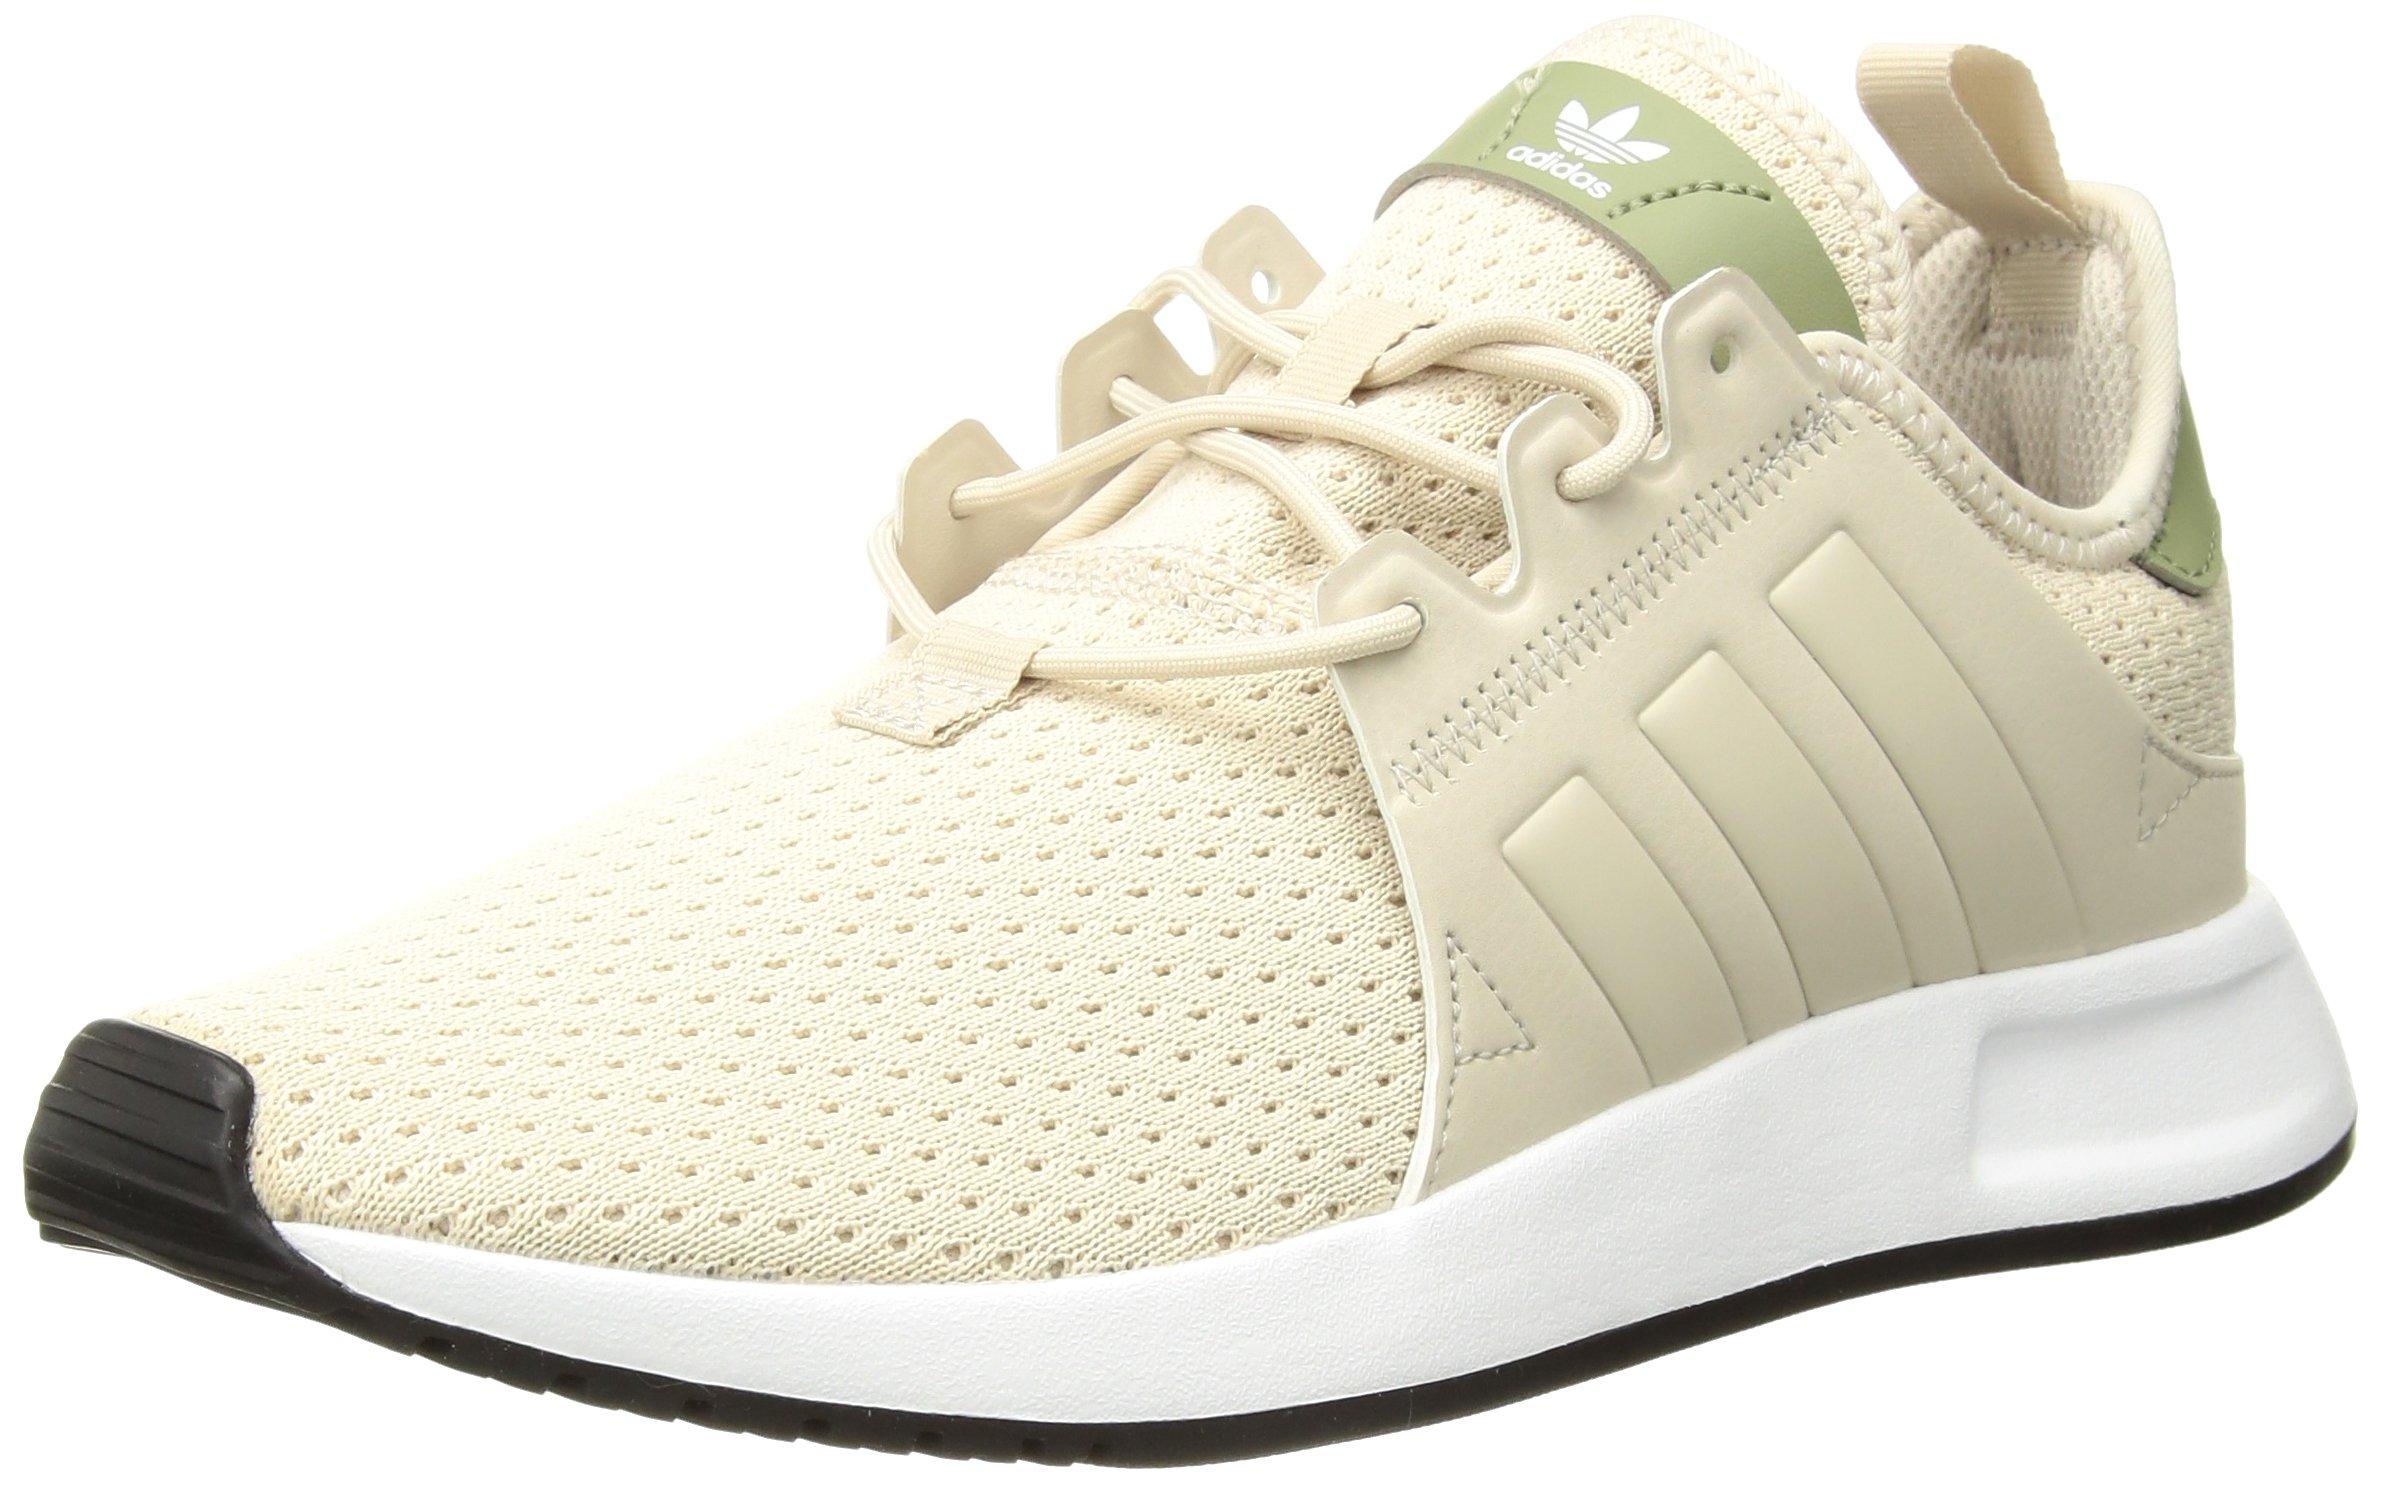 b9eae201de963 Galleon - Adidas Originals Unisex X_PLR J Running Shoe Clear Brown, FTWR  White, 4.5 M US Big Kid